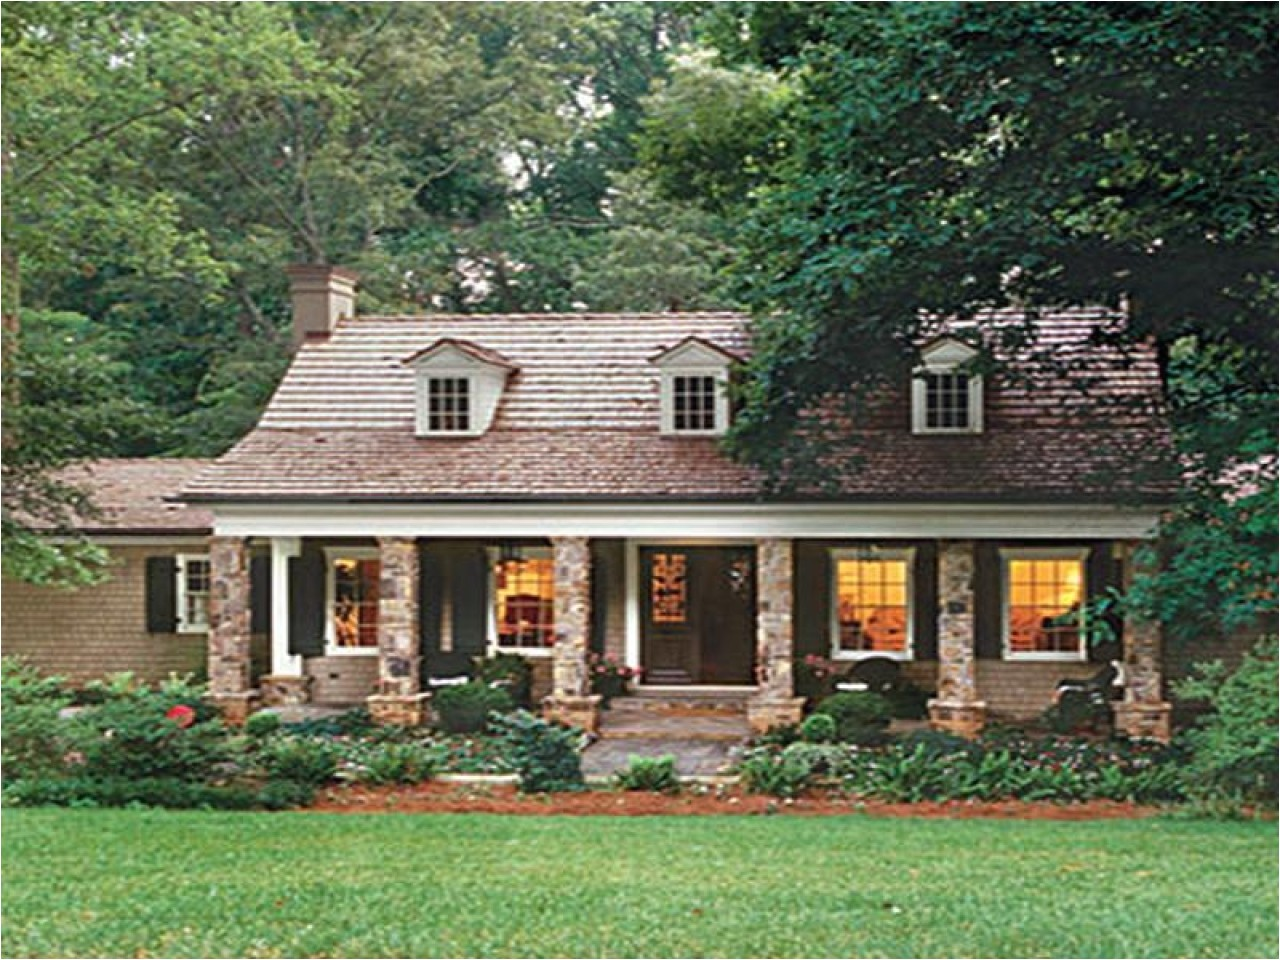 106d108d9d5d3e23 cottage style homes house plans small cottage style homes